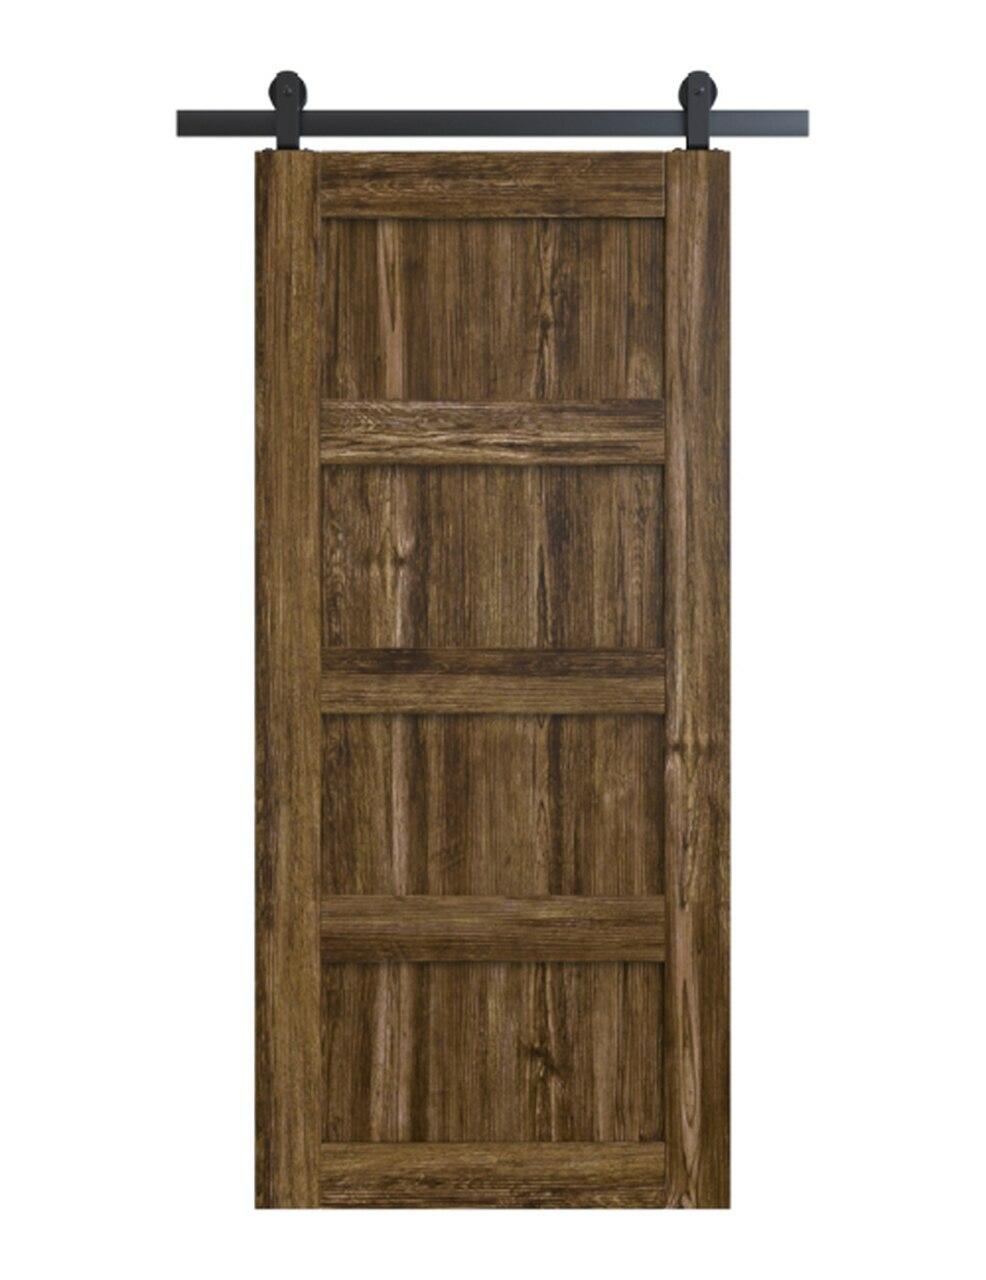 wood stained 4 panel shaker barn door